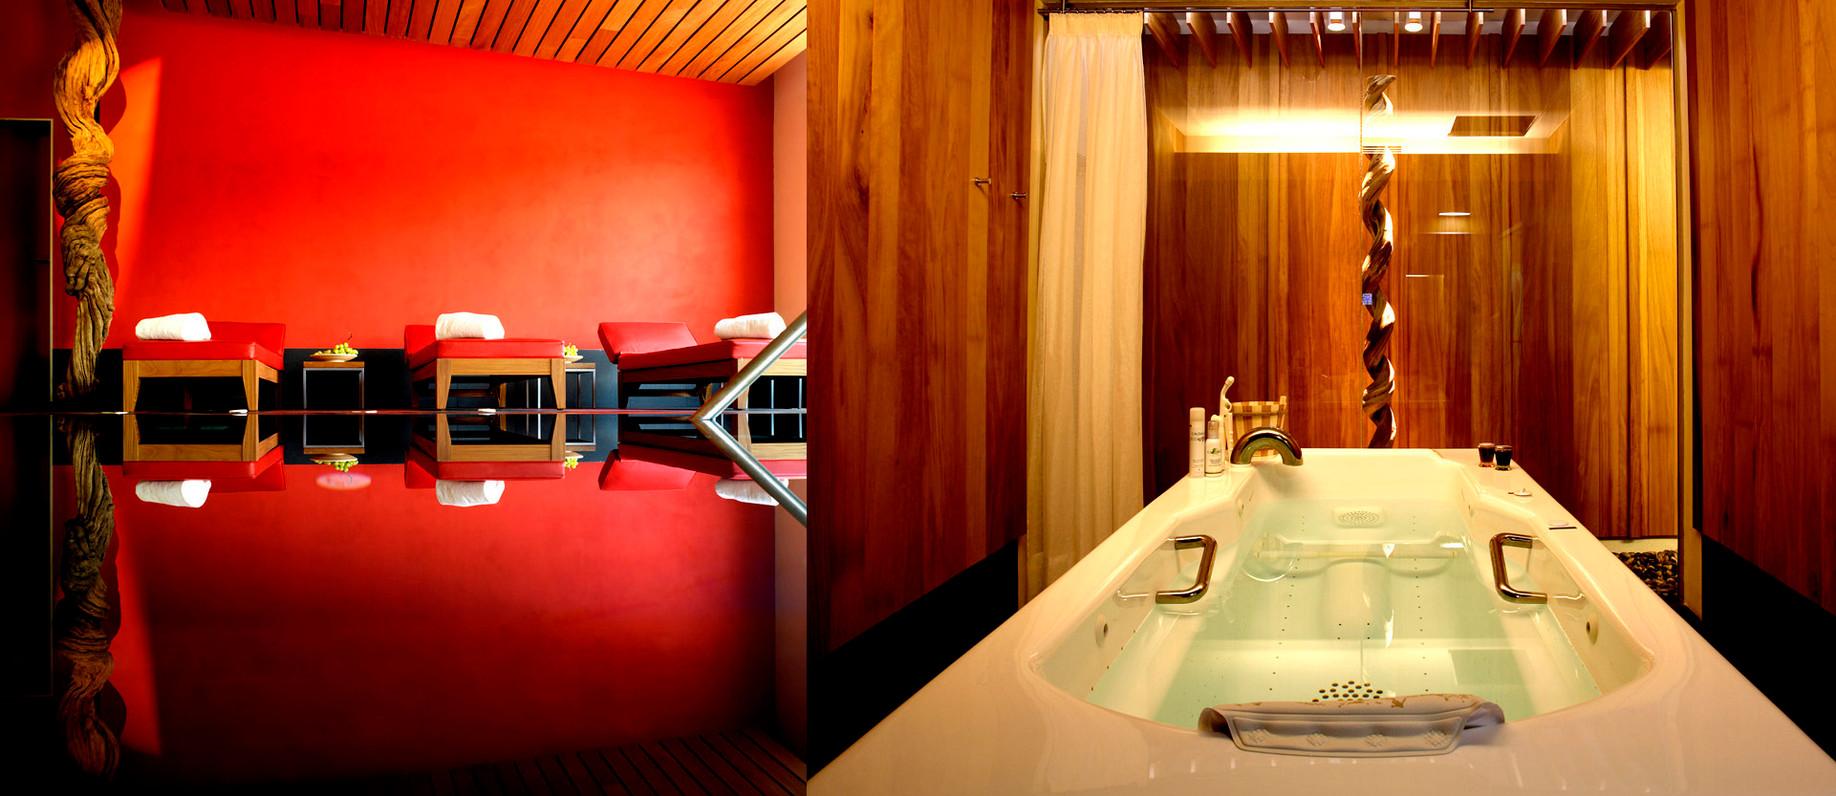 Déco - Hotel - Spa 045.jpg